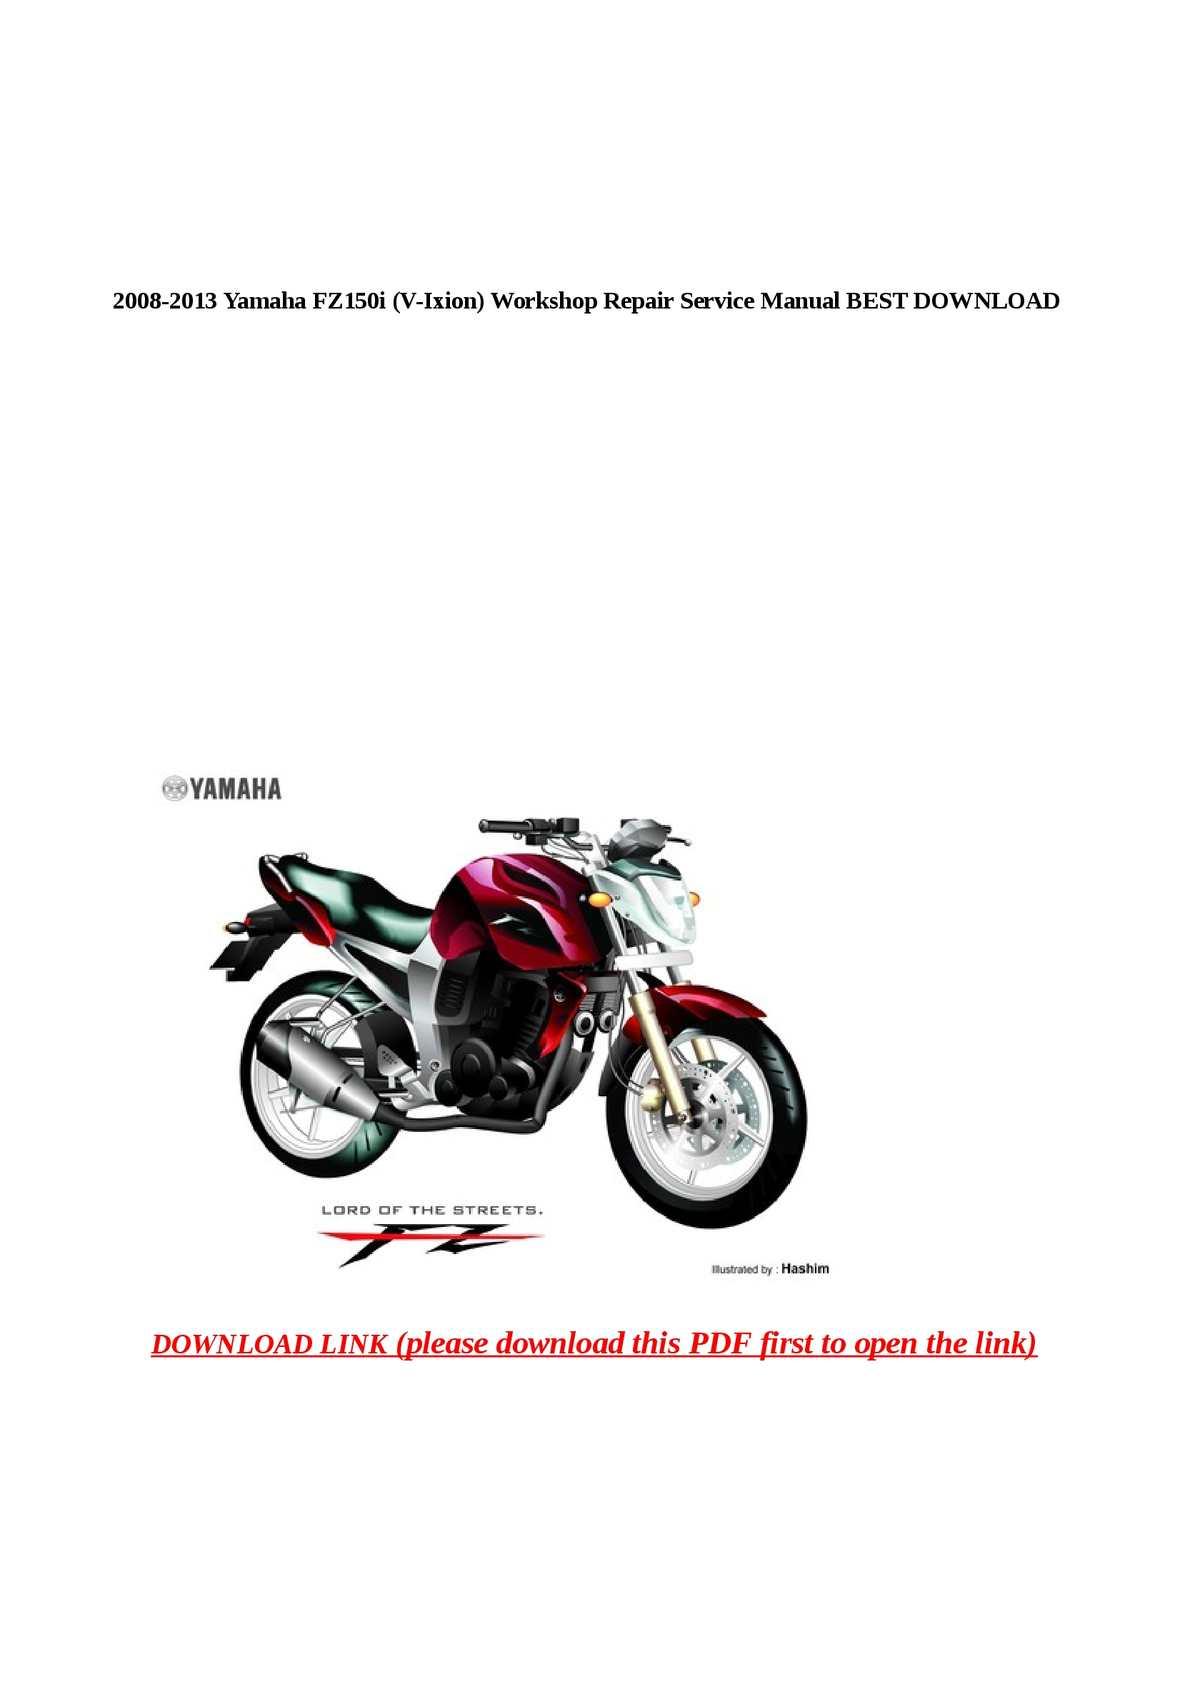 Calam o 2008 2013 yamaha fz150i v ixion workshop repair service manual